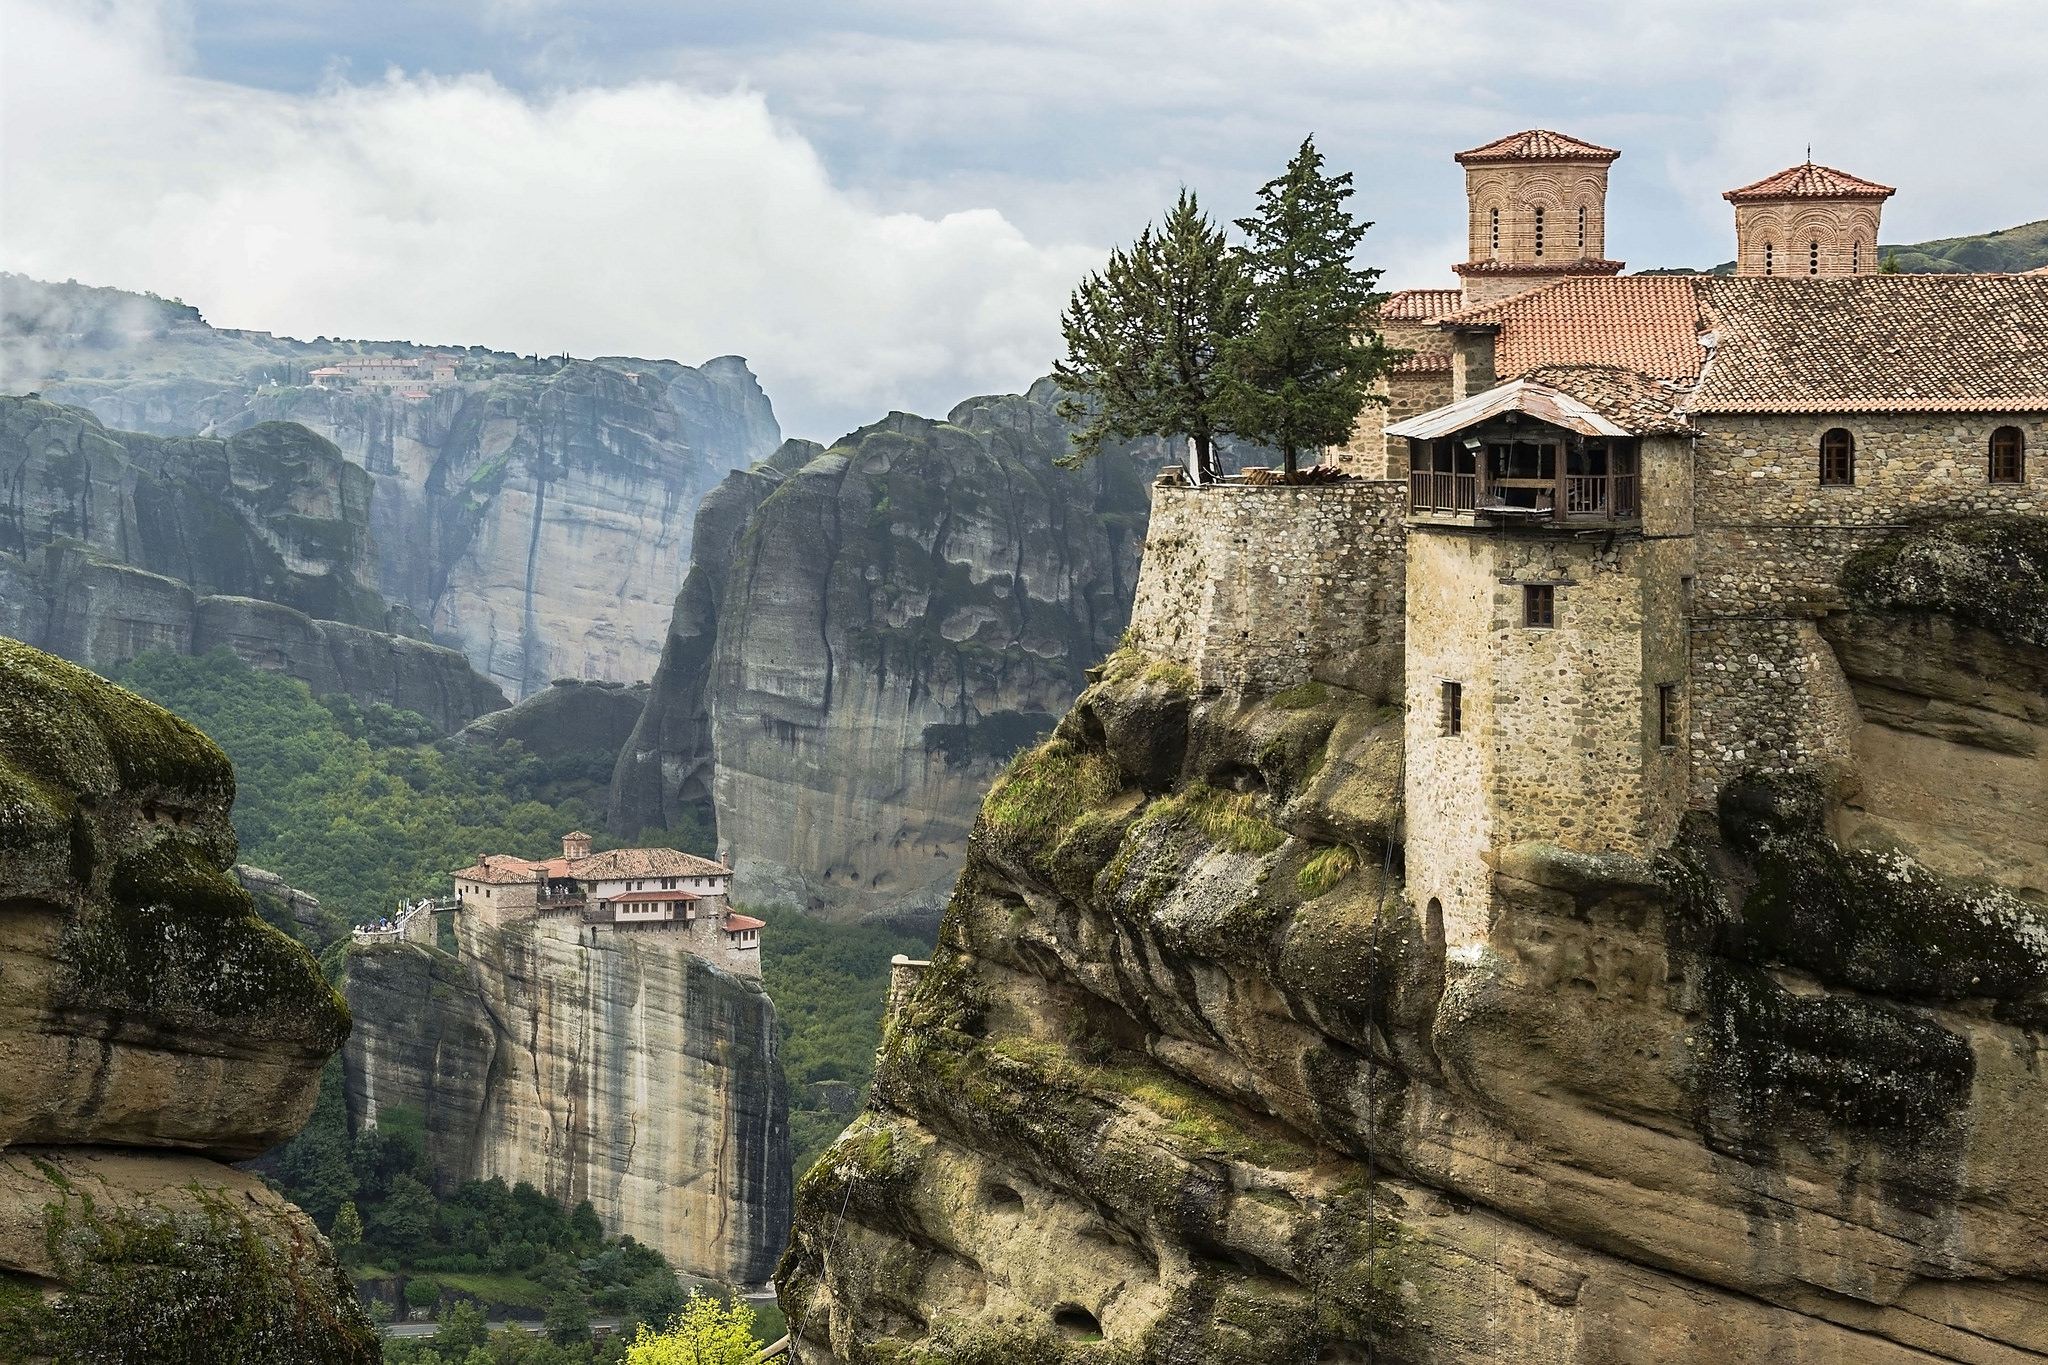 Clifftop monasteries at Meteora. Photo credit: Guillén Pérez